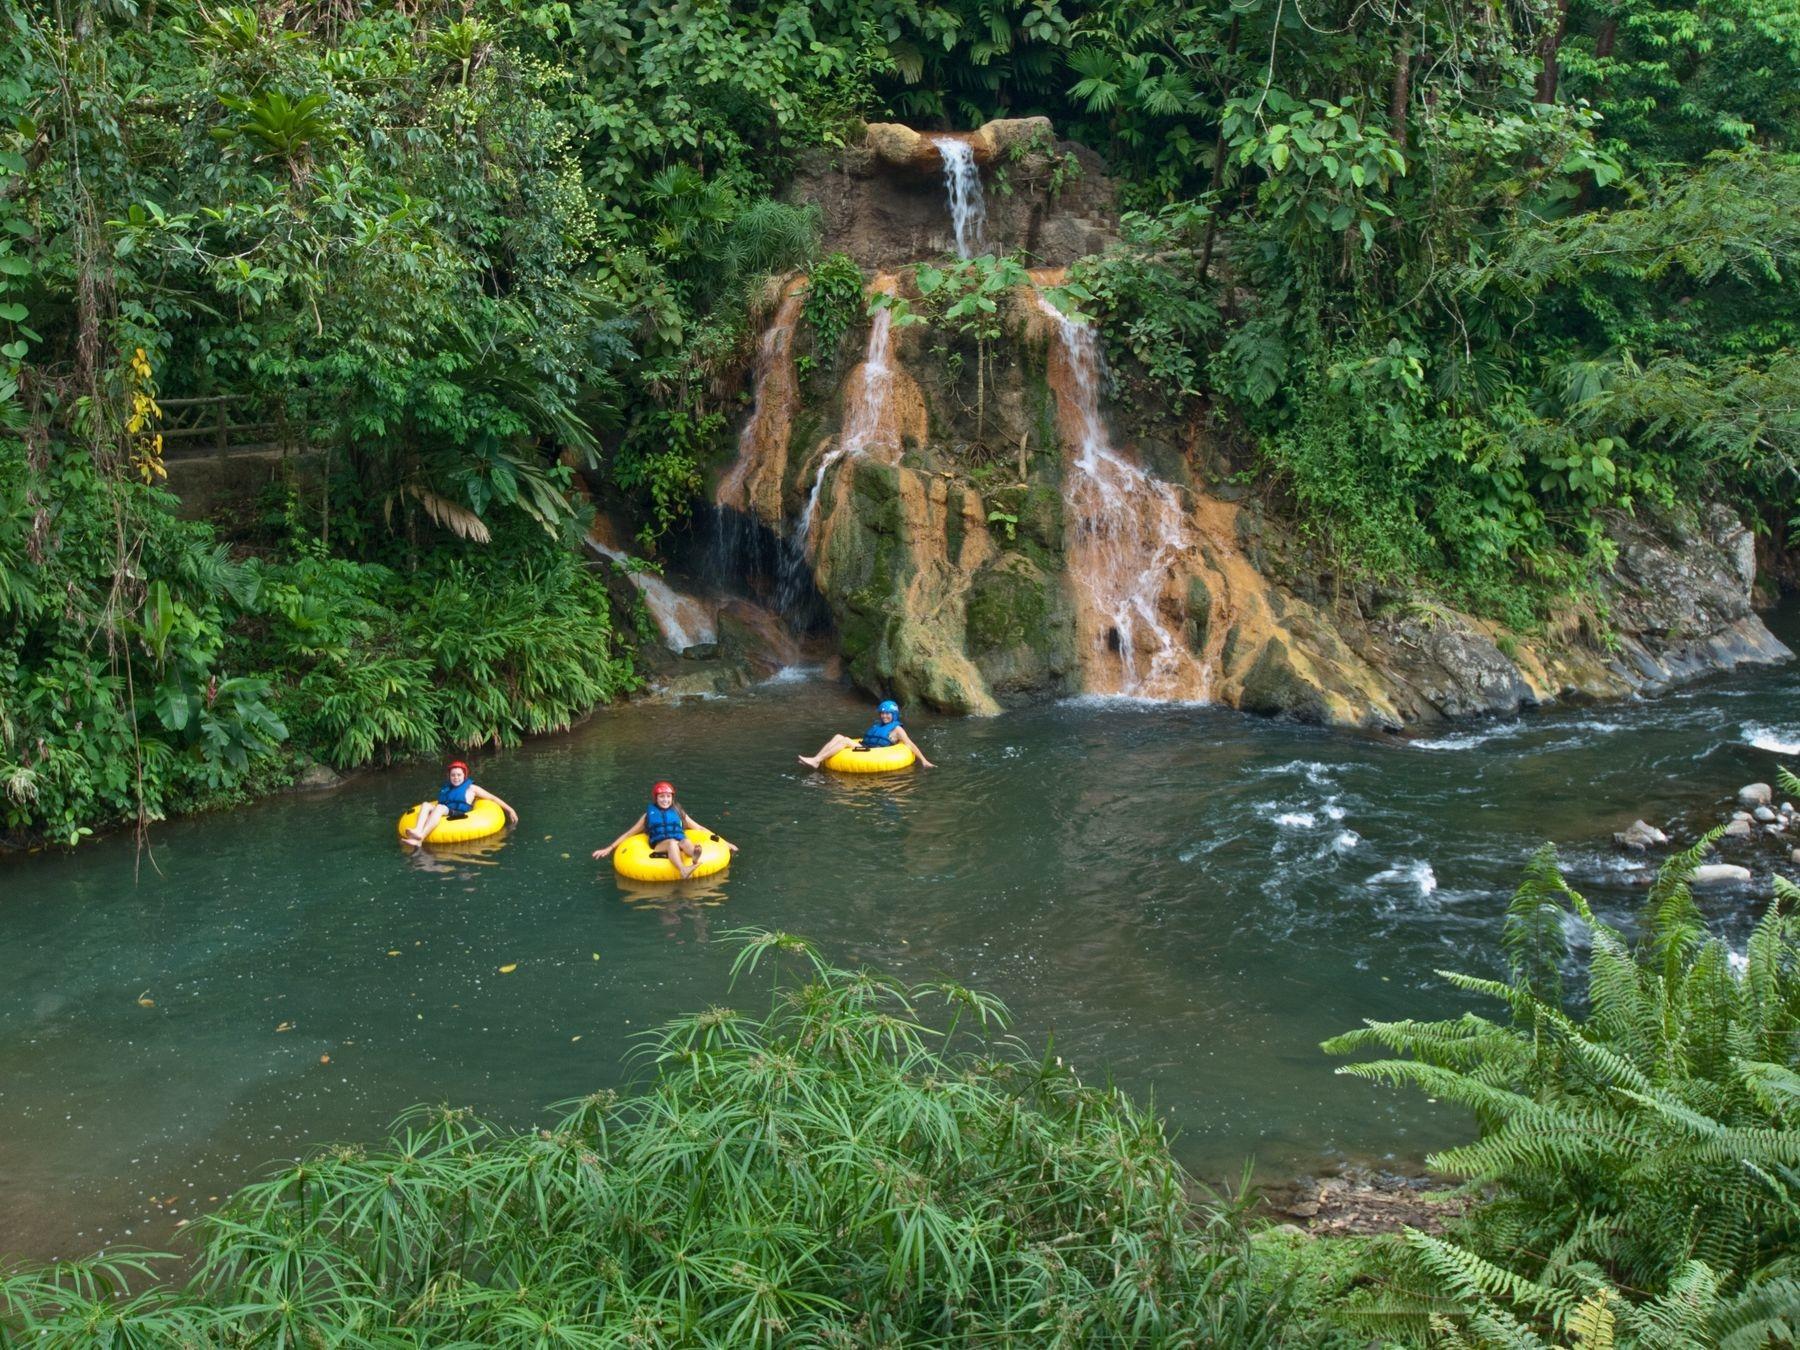 guest tubing near small waterfall